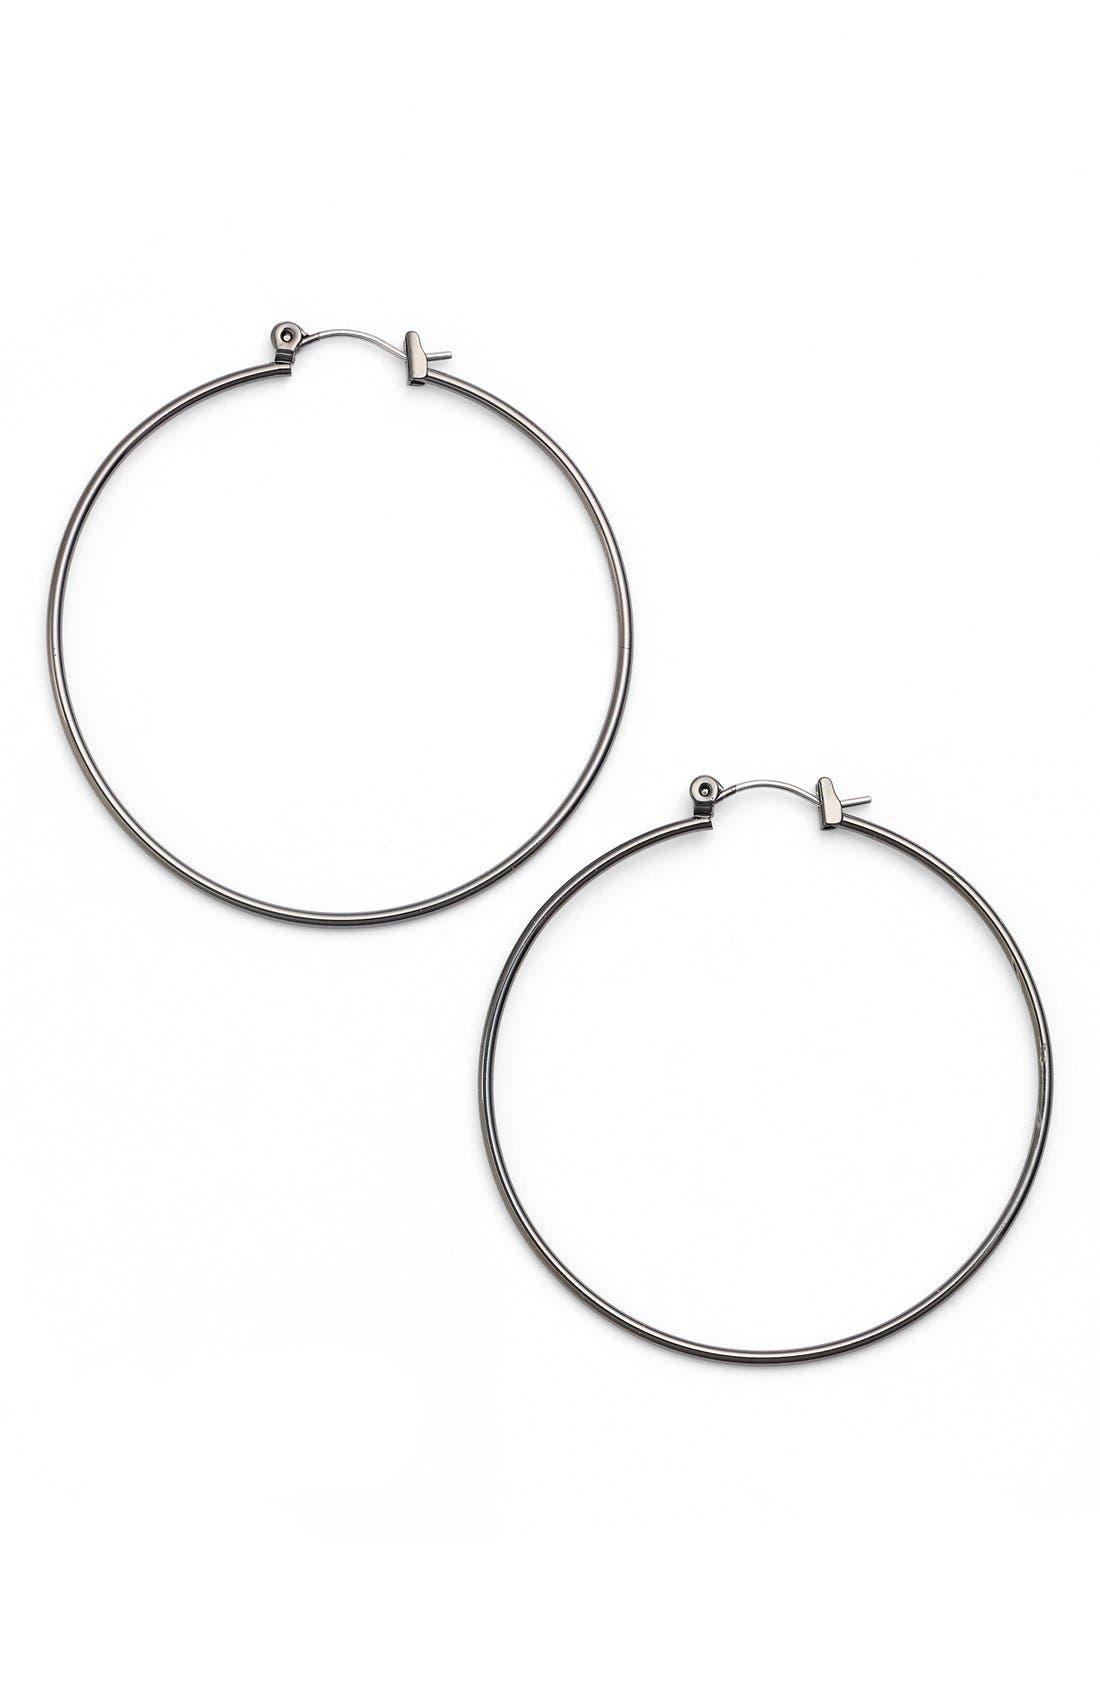 Main Image - Nordstrom 'Medium Whisper' Hoop Earrings